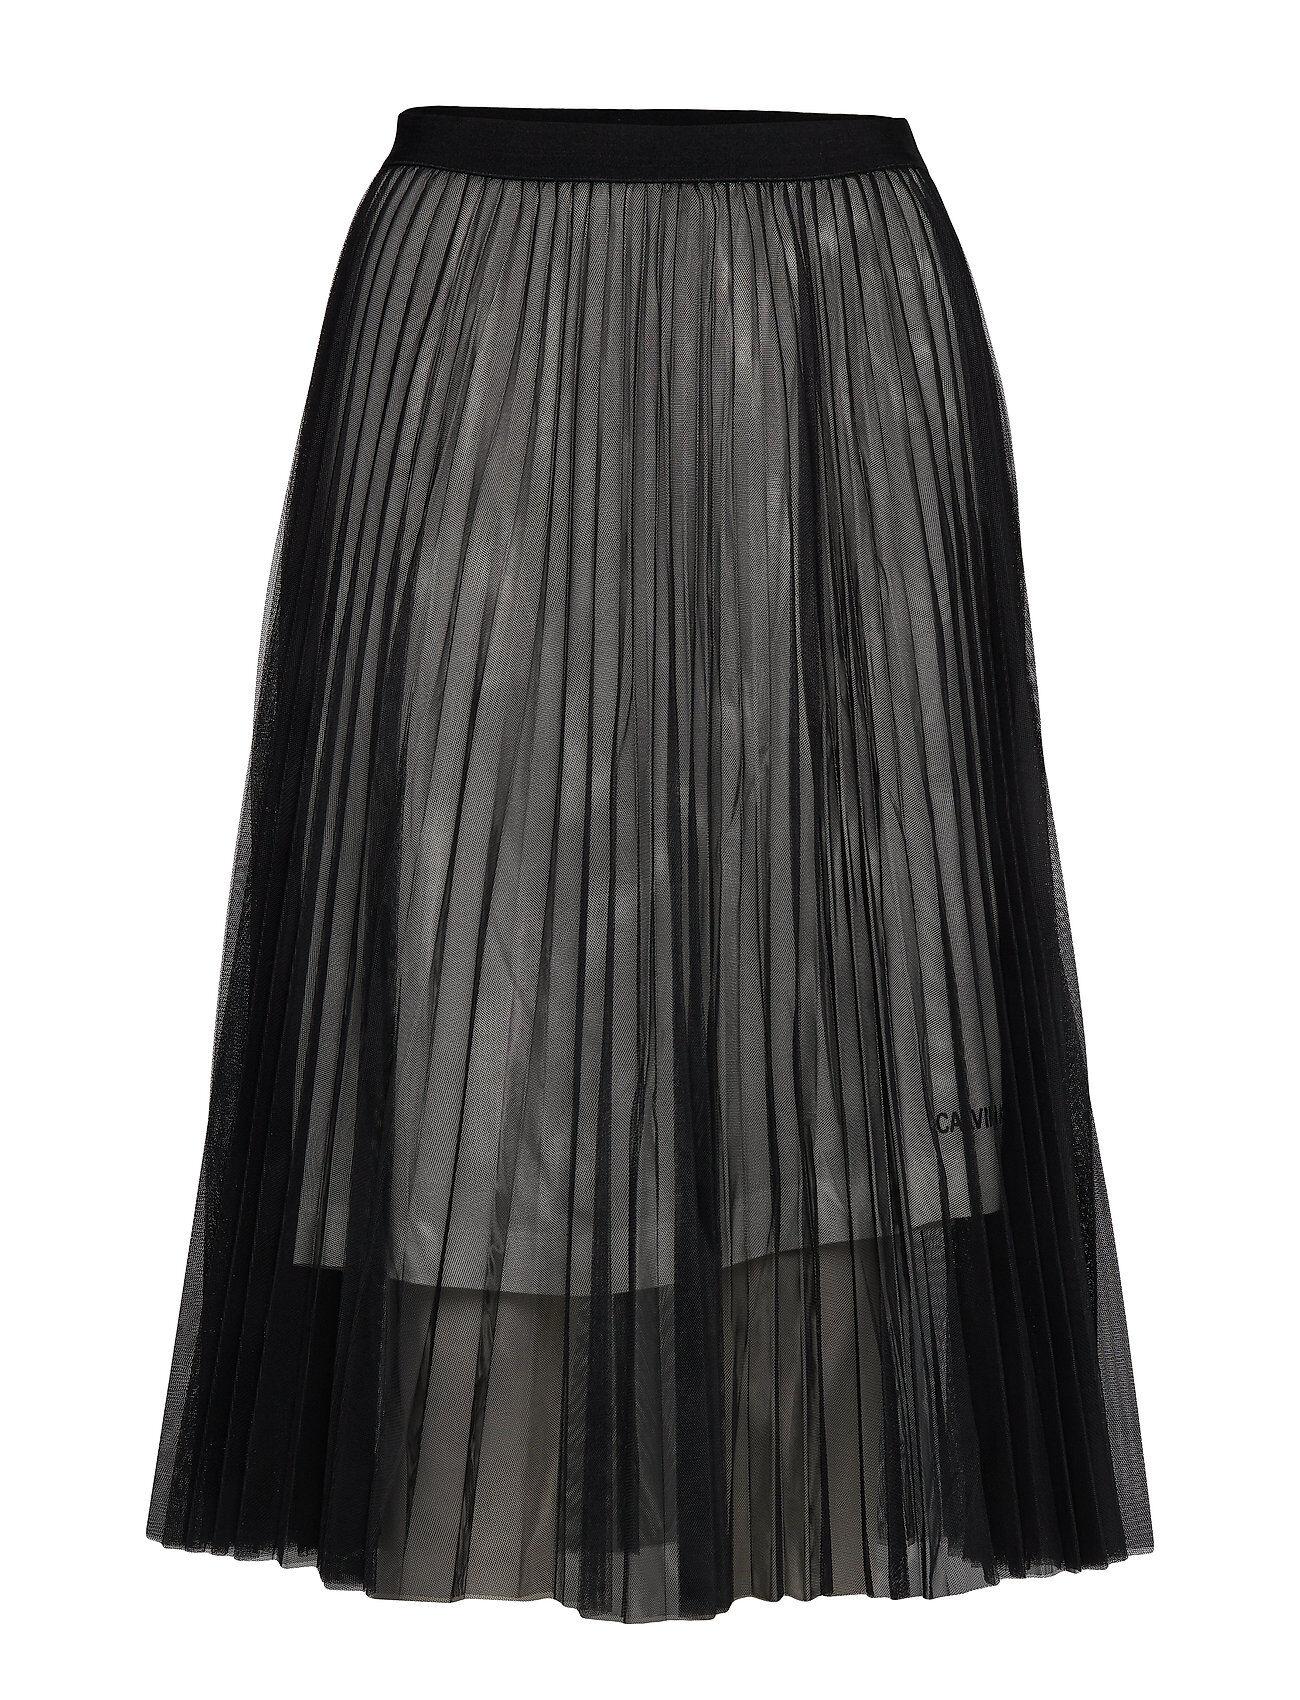 Image of Calvin Pleated Mesh Double Layer Skirt Polvipituinen Hame Musta Calvin Klein Jeans